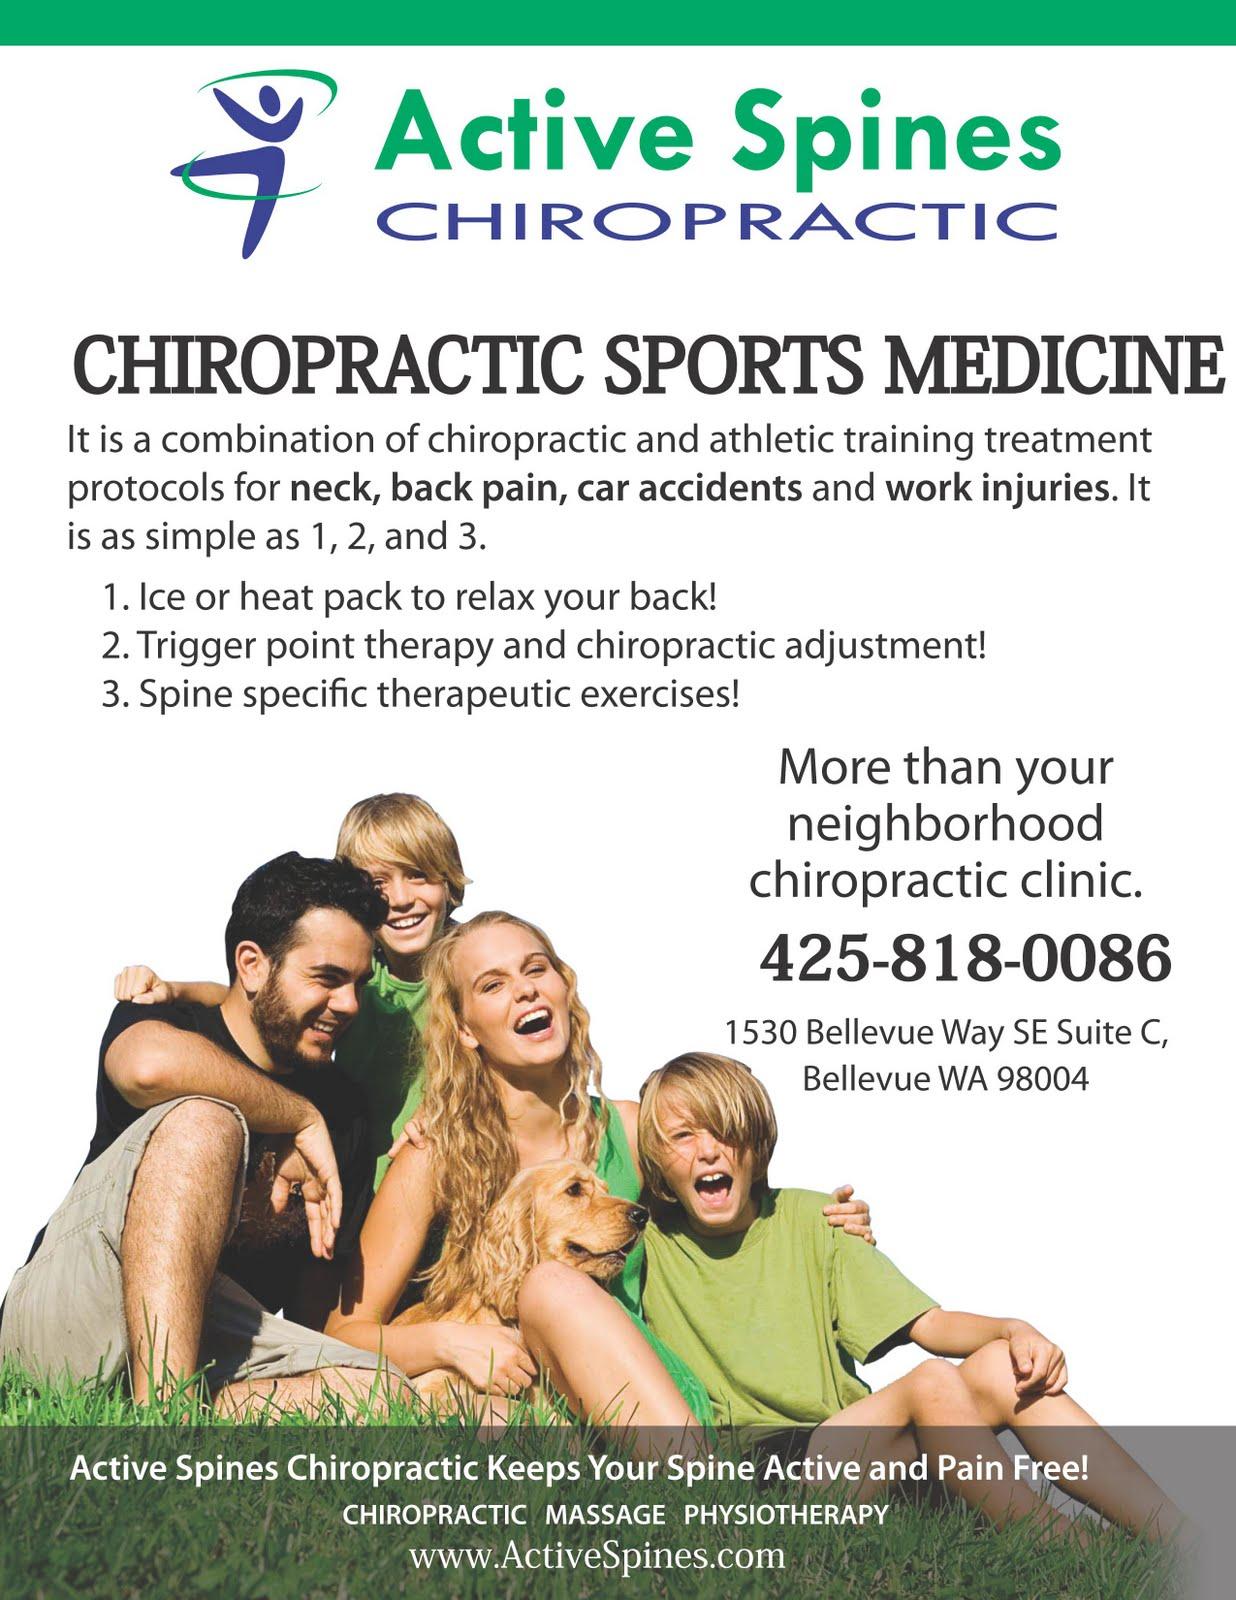 chiropractic sports medicine flyer